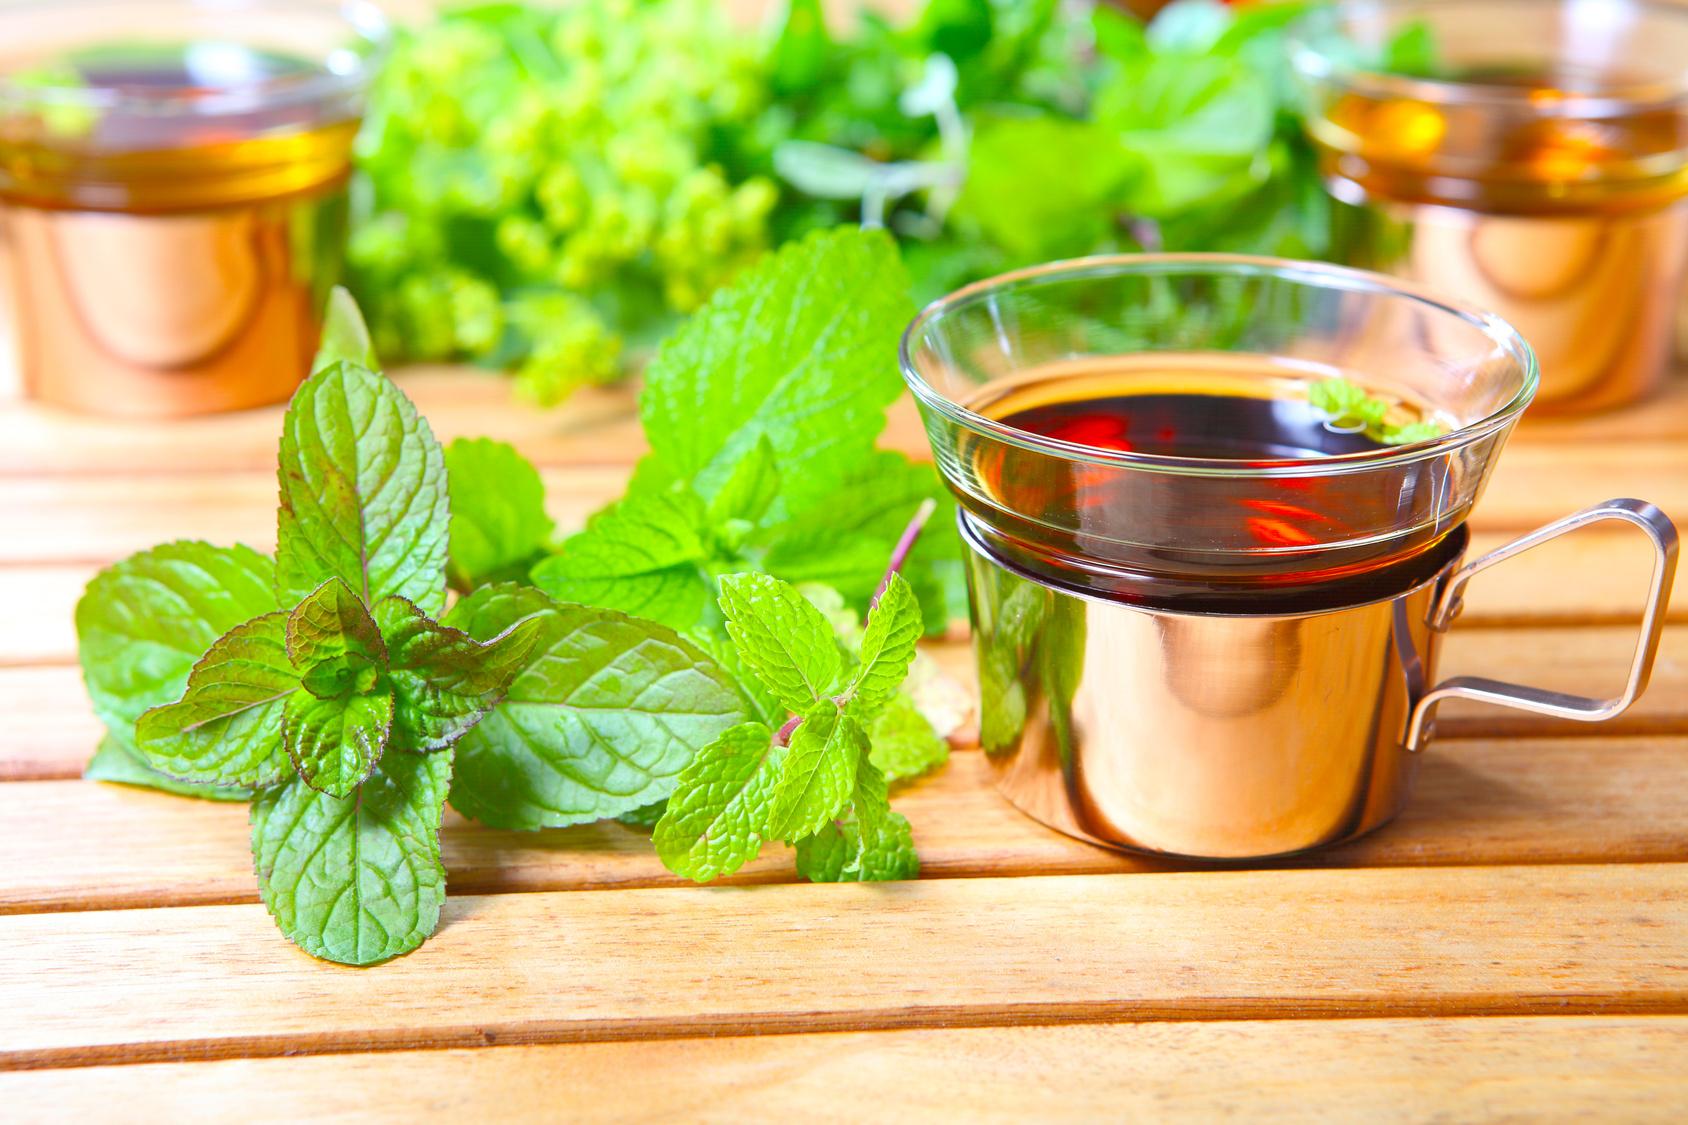 Buy Lemon Balm Tea: Benefits, Preparation, Side Effects ...